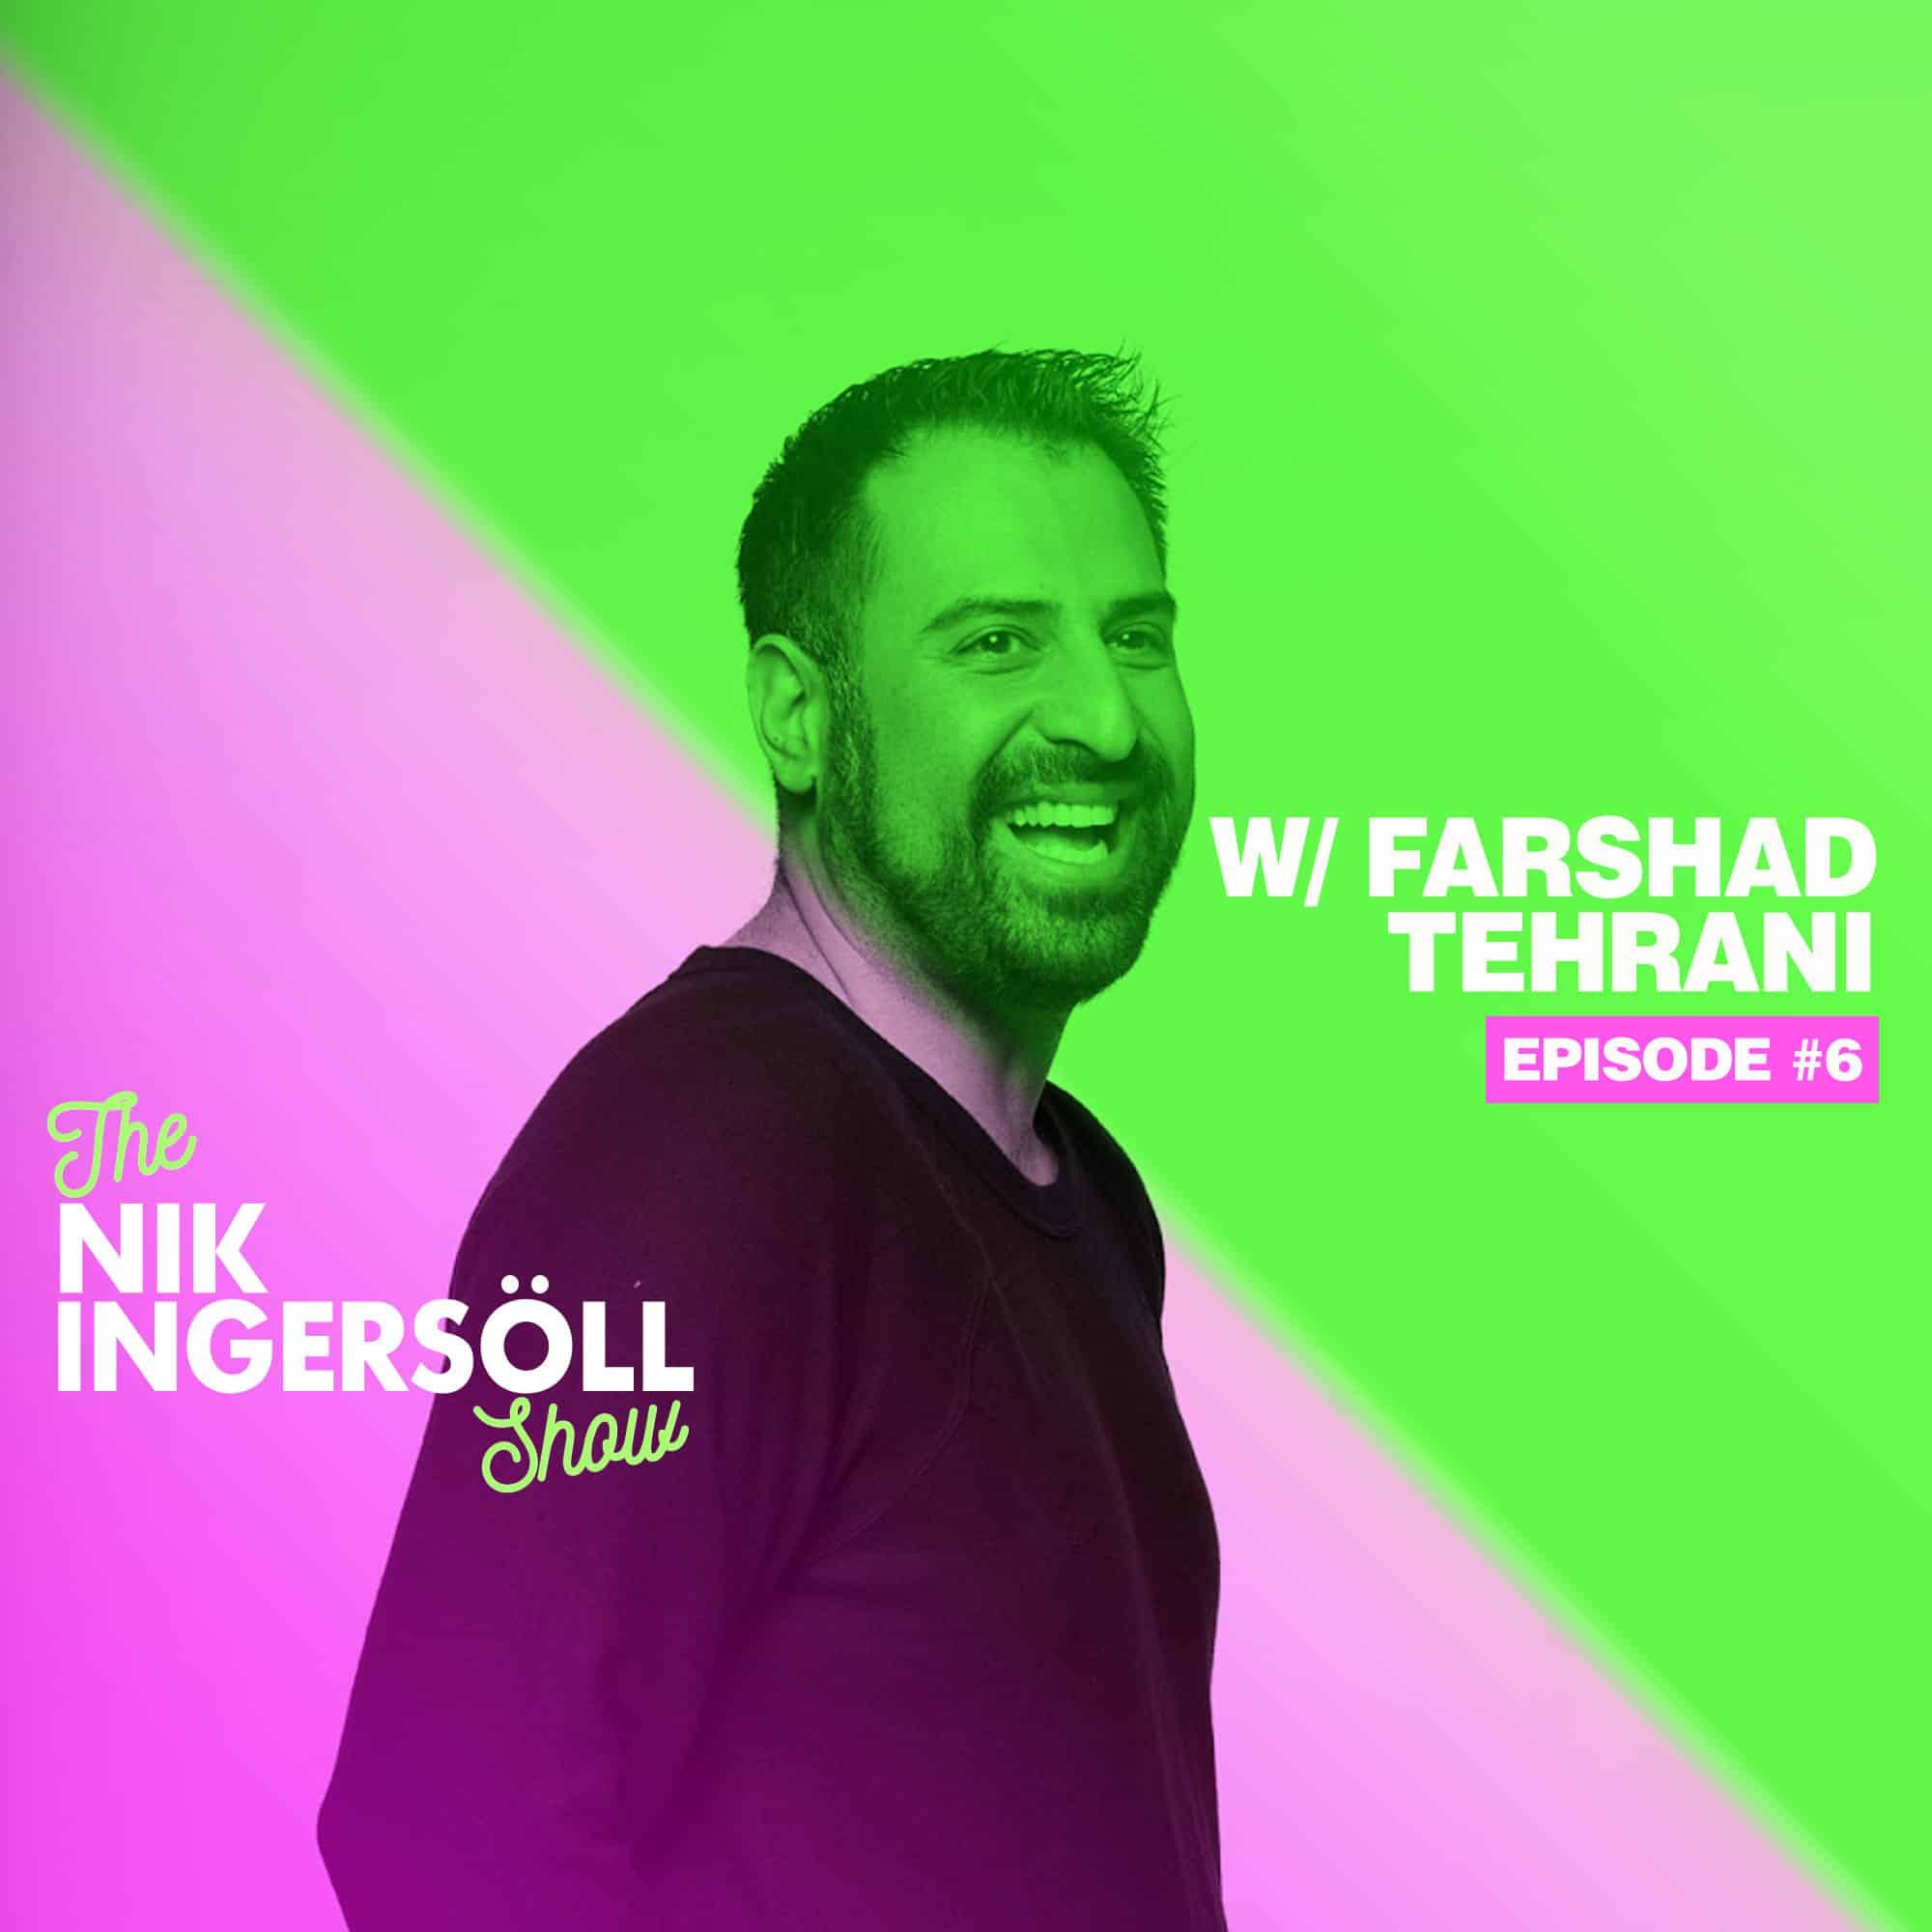 #6: Farshad Tehrani – Farghini Salomondrin – (Podcast) The Nik Ingersoll Show